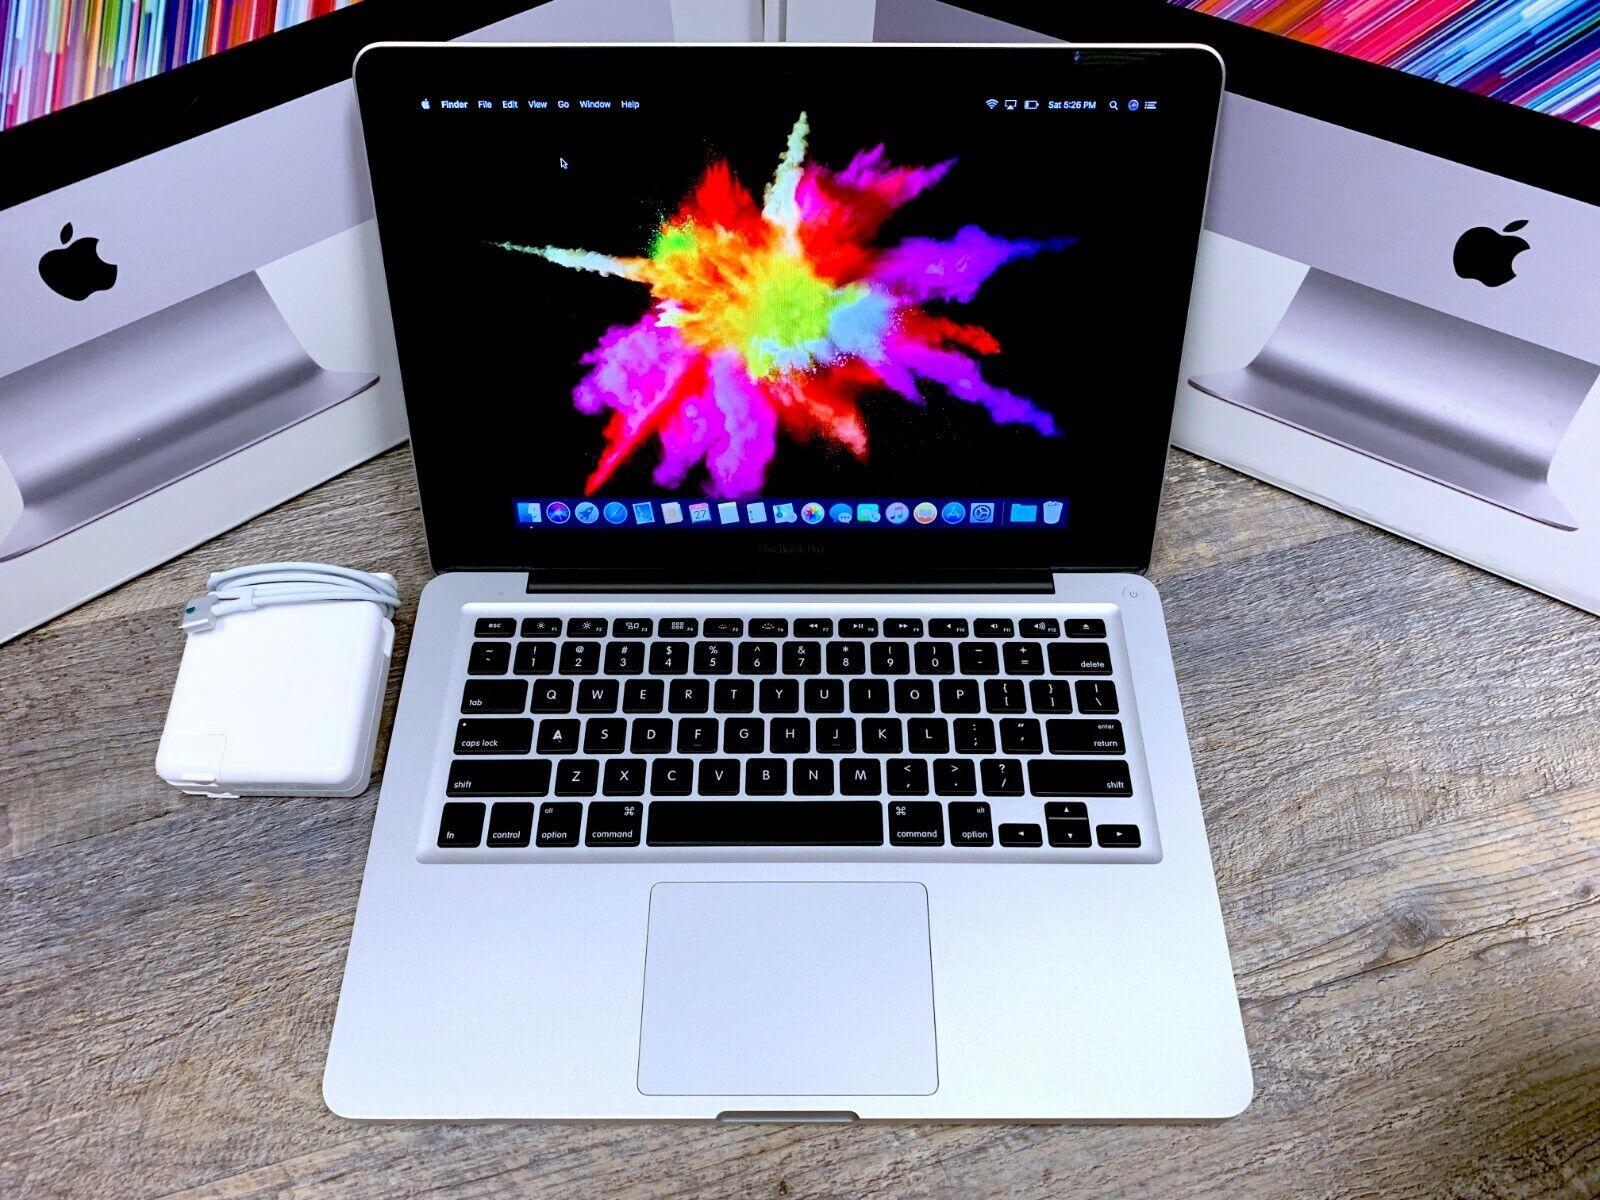 Apple MacBook Pro 13 inch Laptop / 8GB / 128GB SSD / 2.3Ghz / 3YR WARRANTY. Buy it now for 479.00